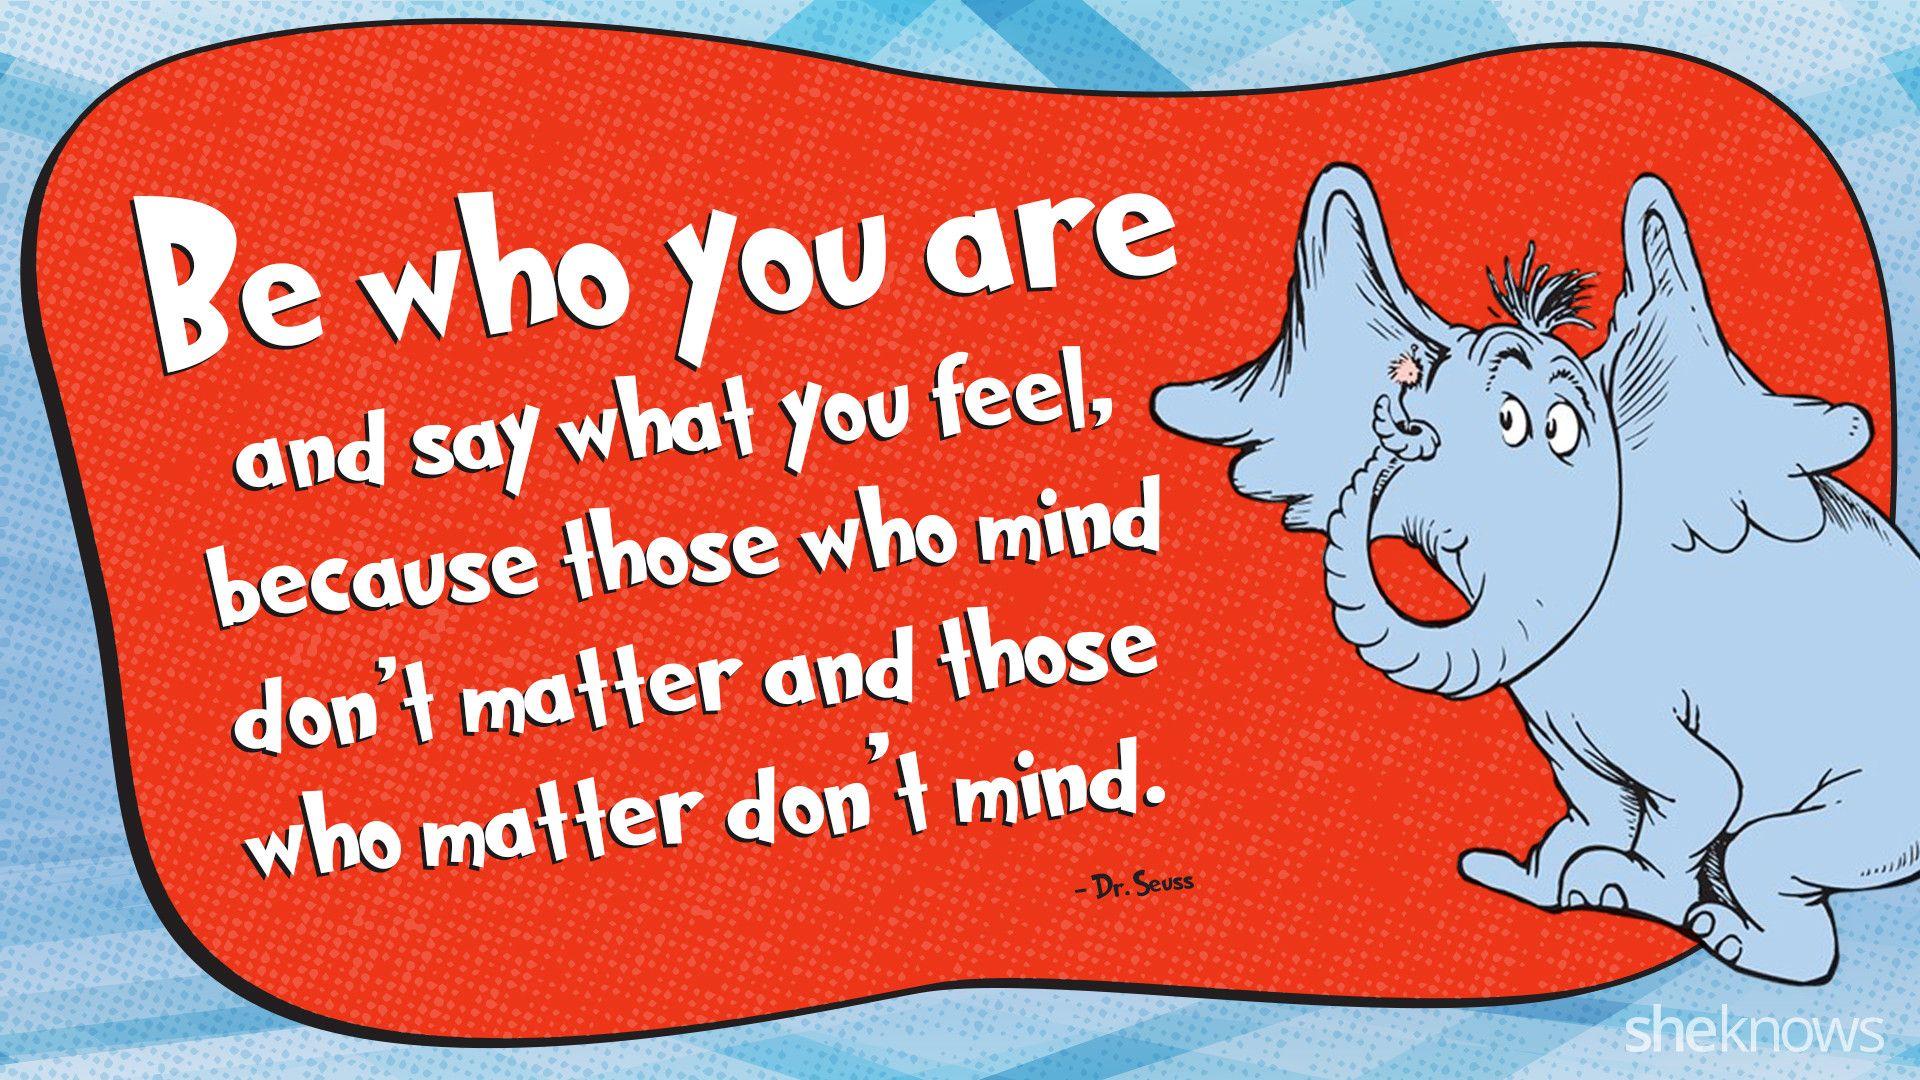 Dr Seuss Quotes Every Little Kid Should Hear Seuss Quotes Dr